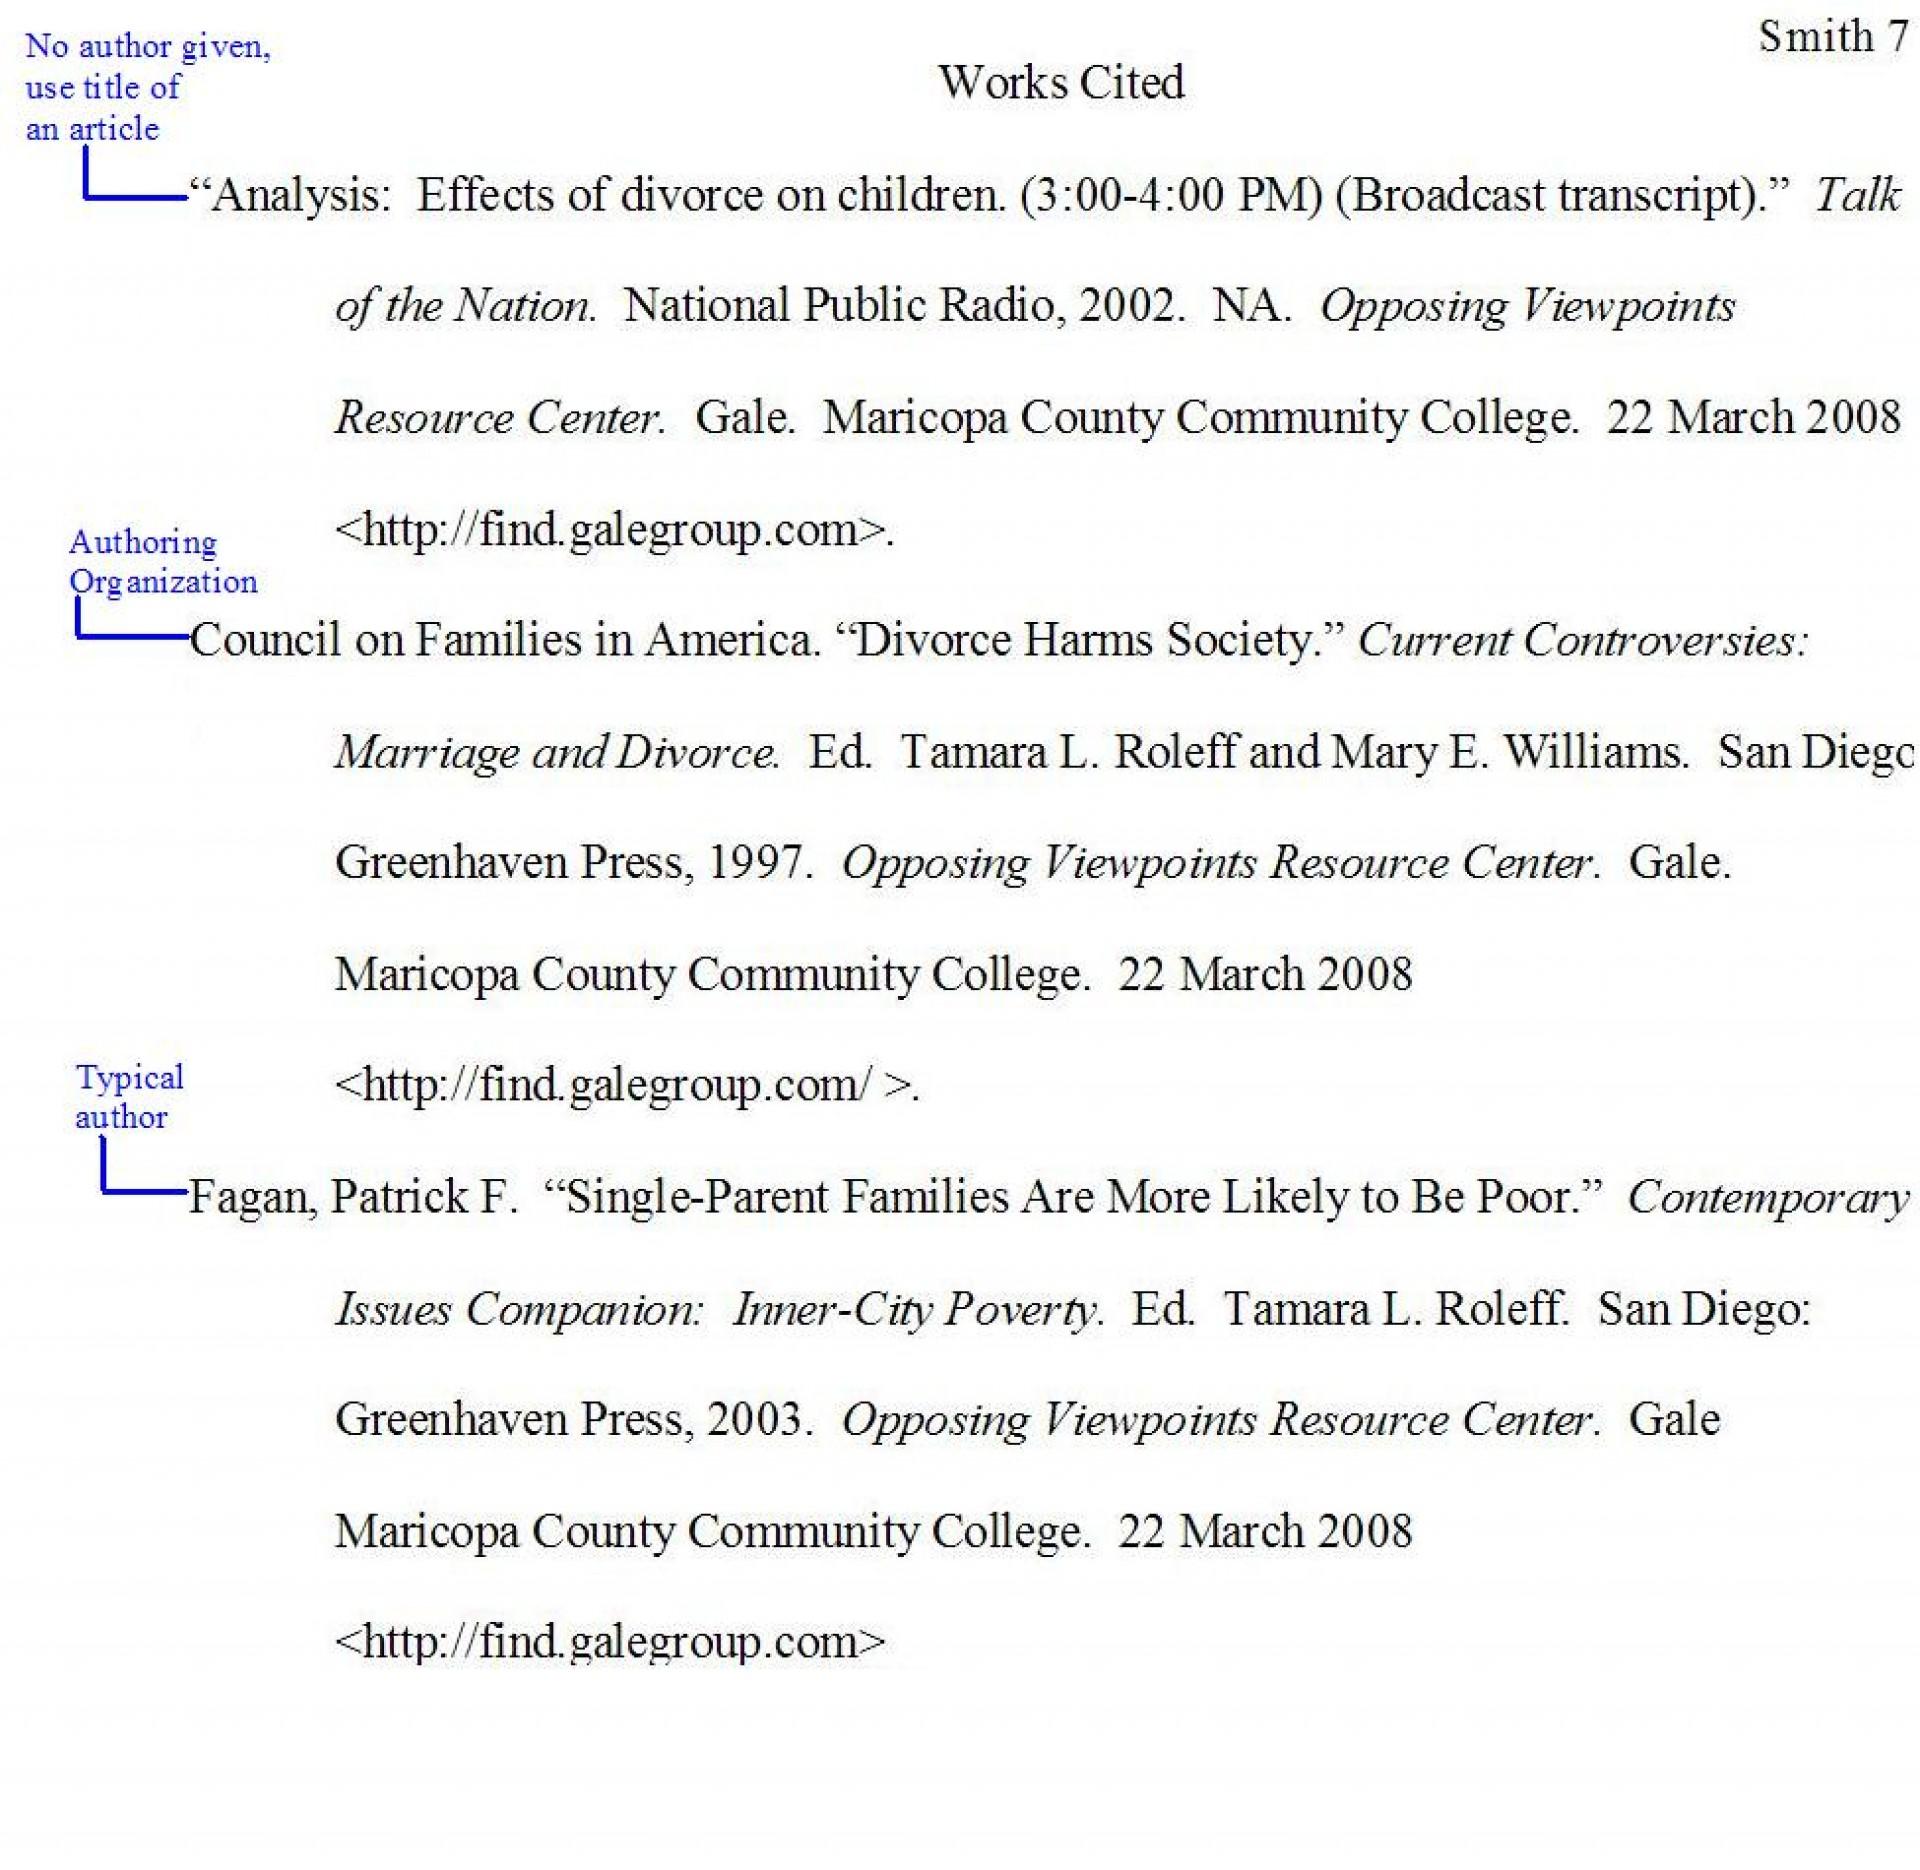 007 Fix My Essay Example Samplewrkctd Singular Generator Free Title Online 1920